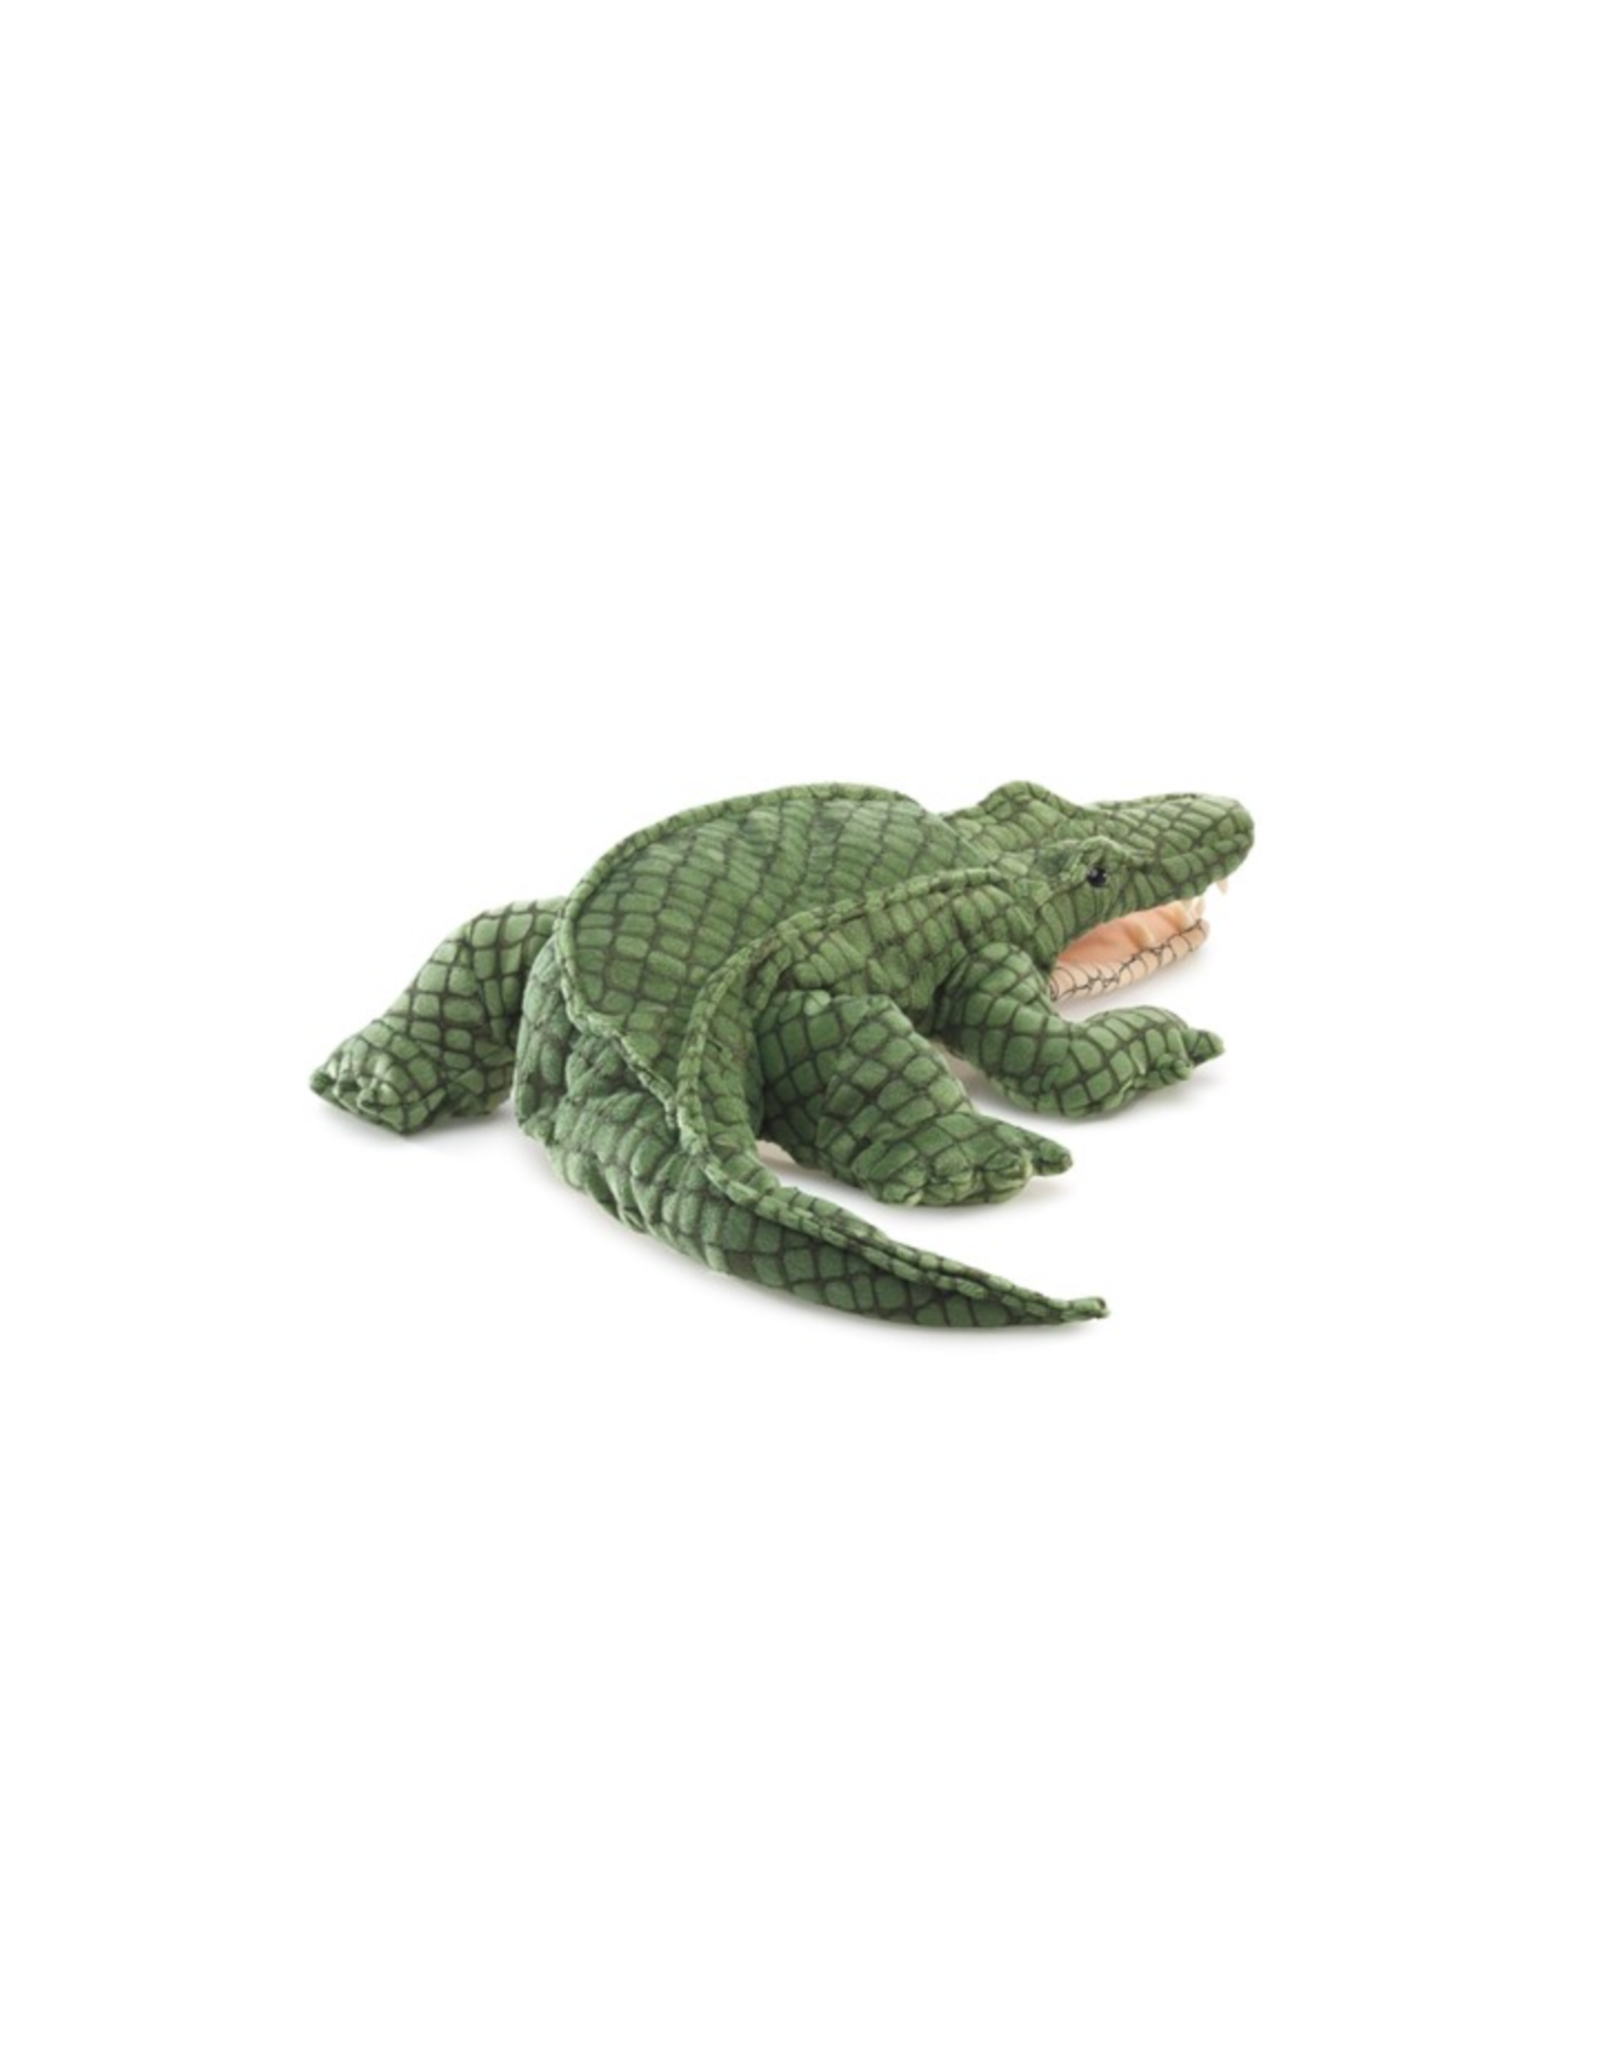 Folkmanis Alligator puppet